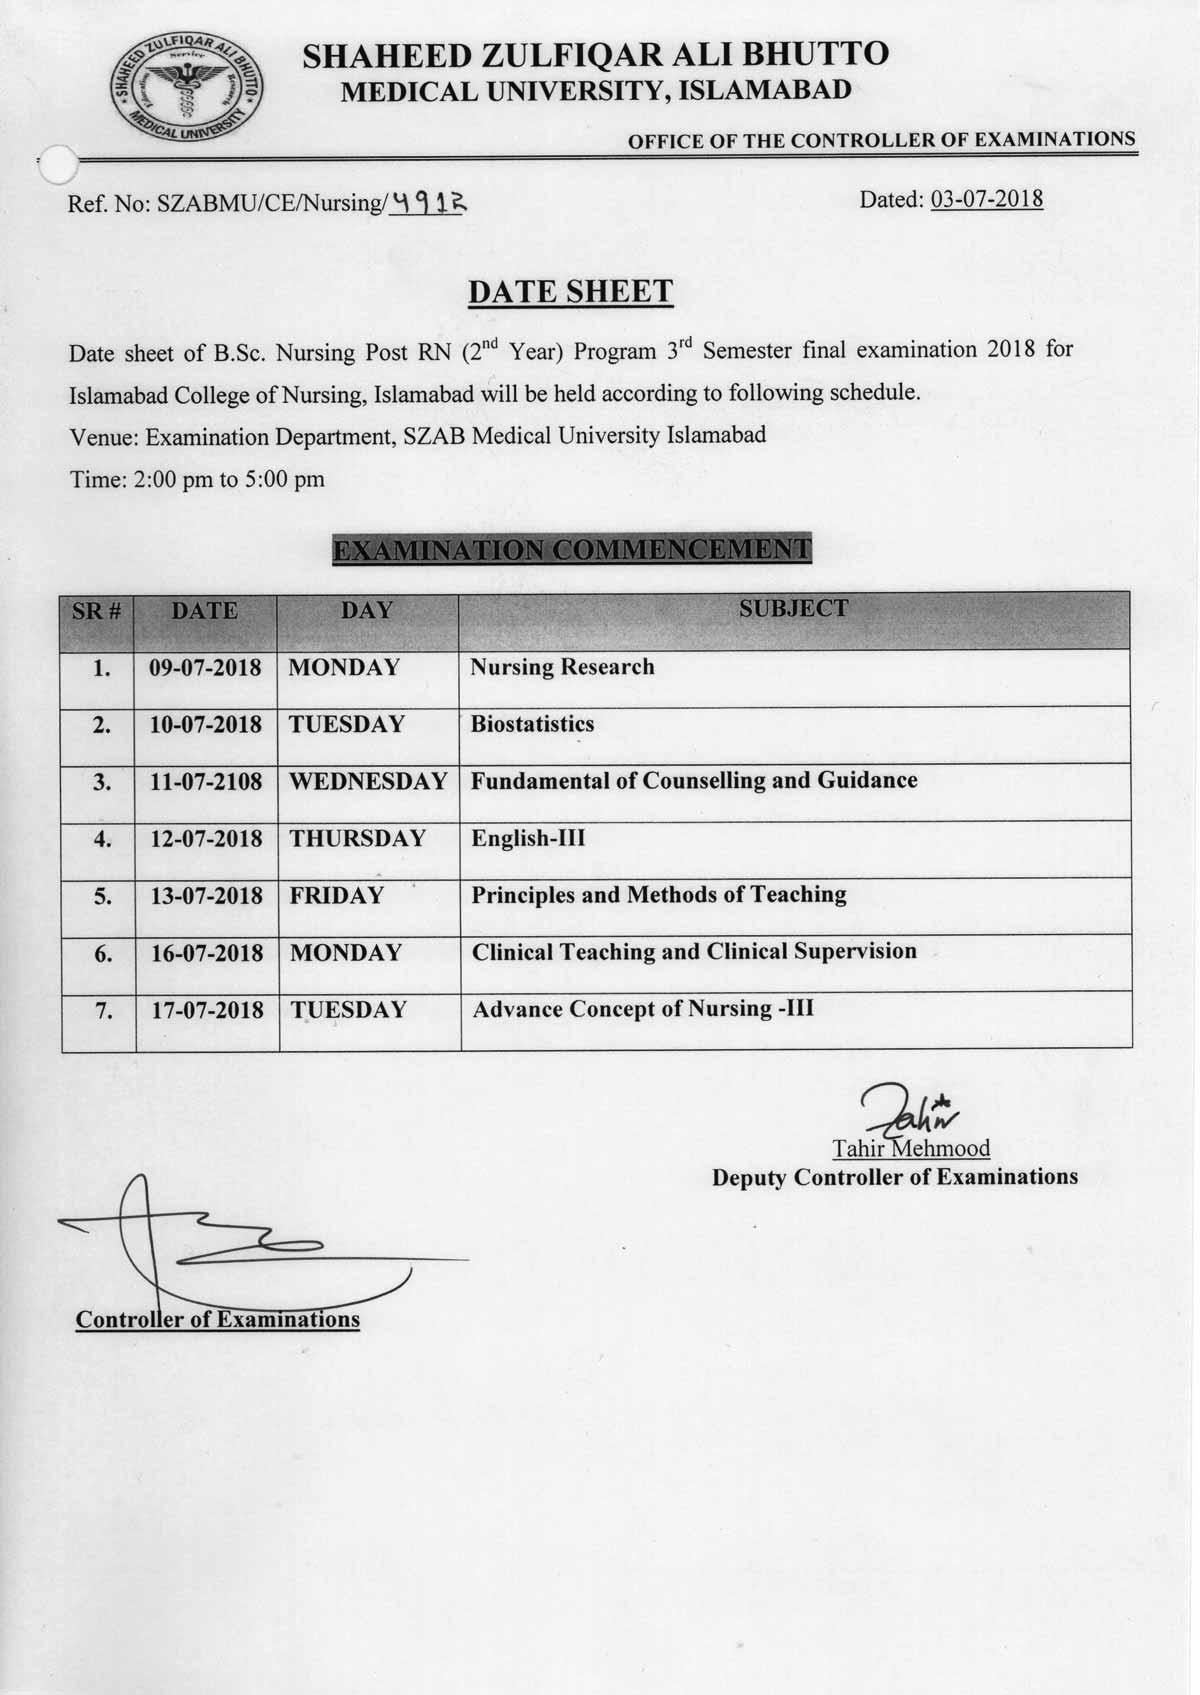 Date Sheet - B.Sc Nursing Post RN 3rd Semester for Islamabad College of Nursing